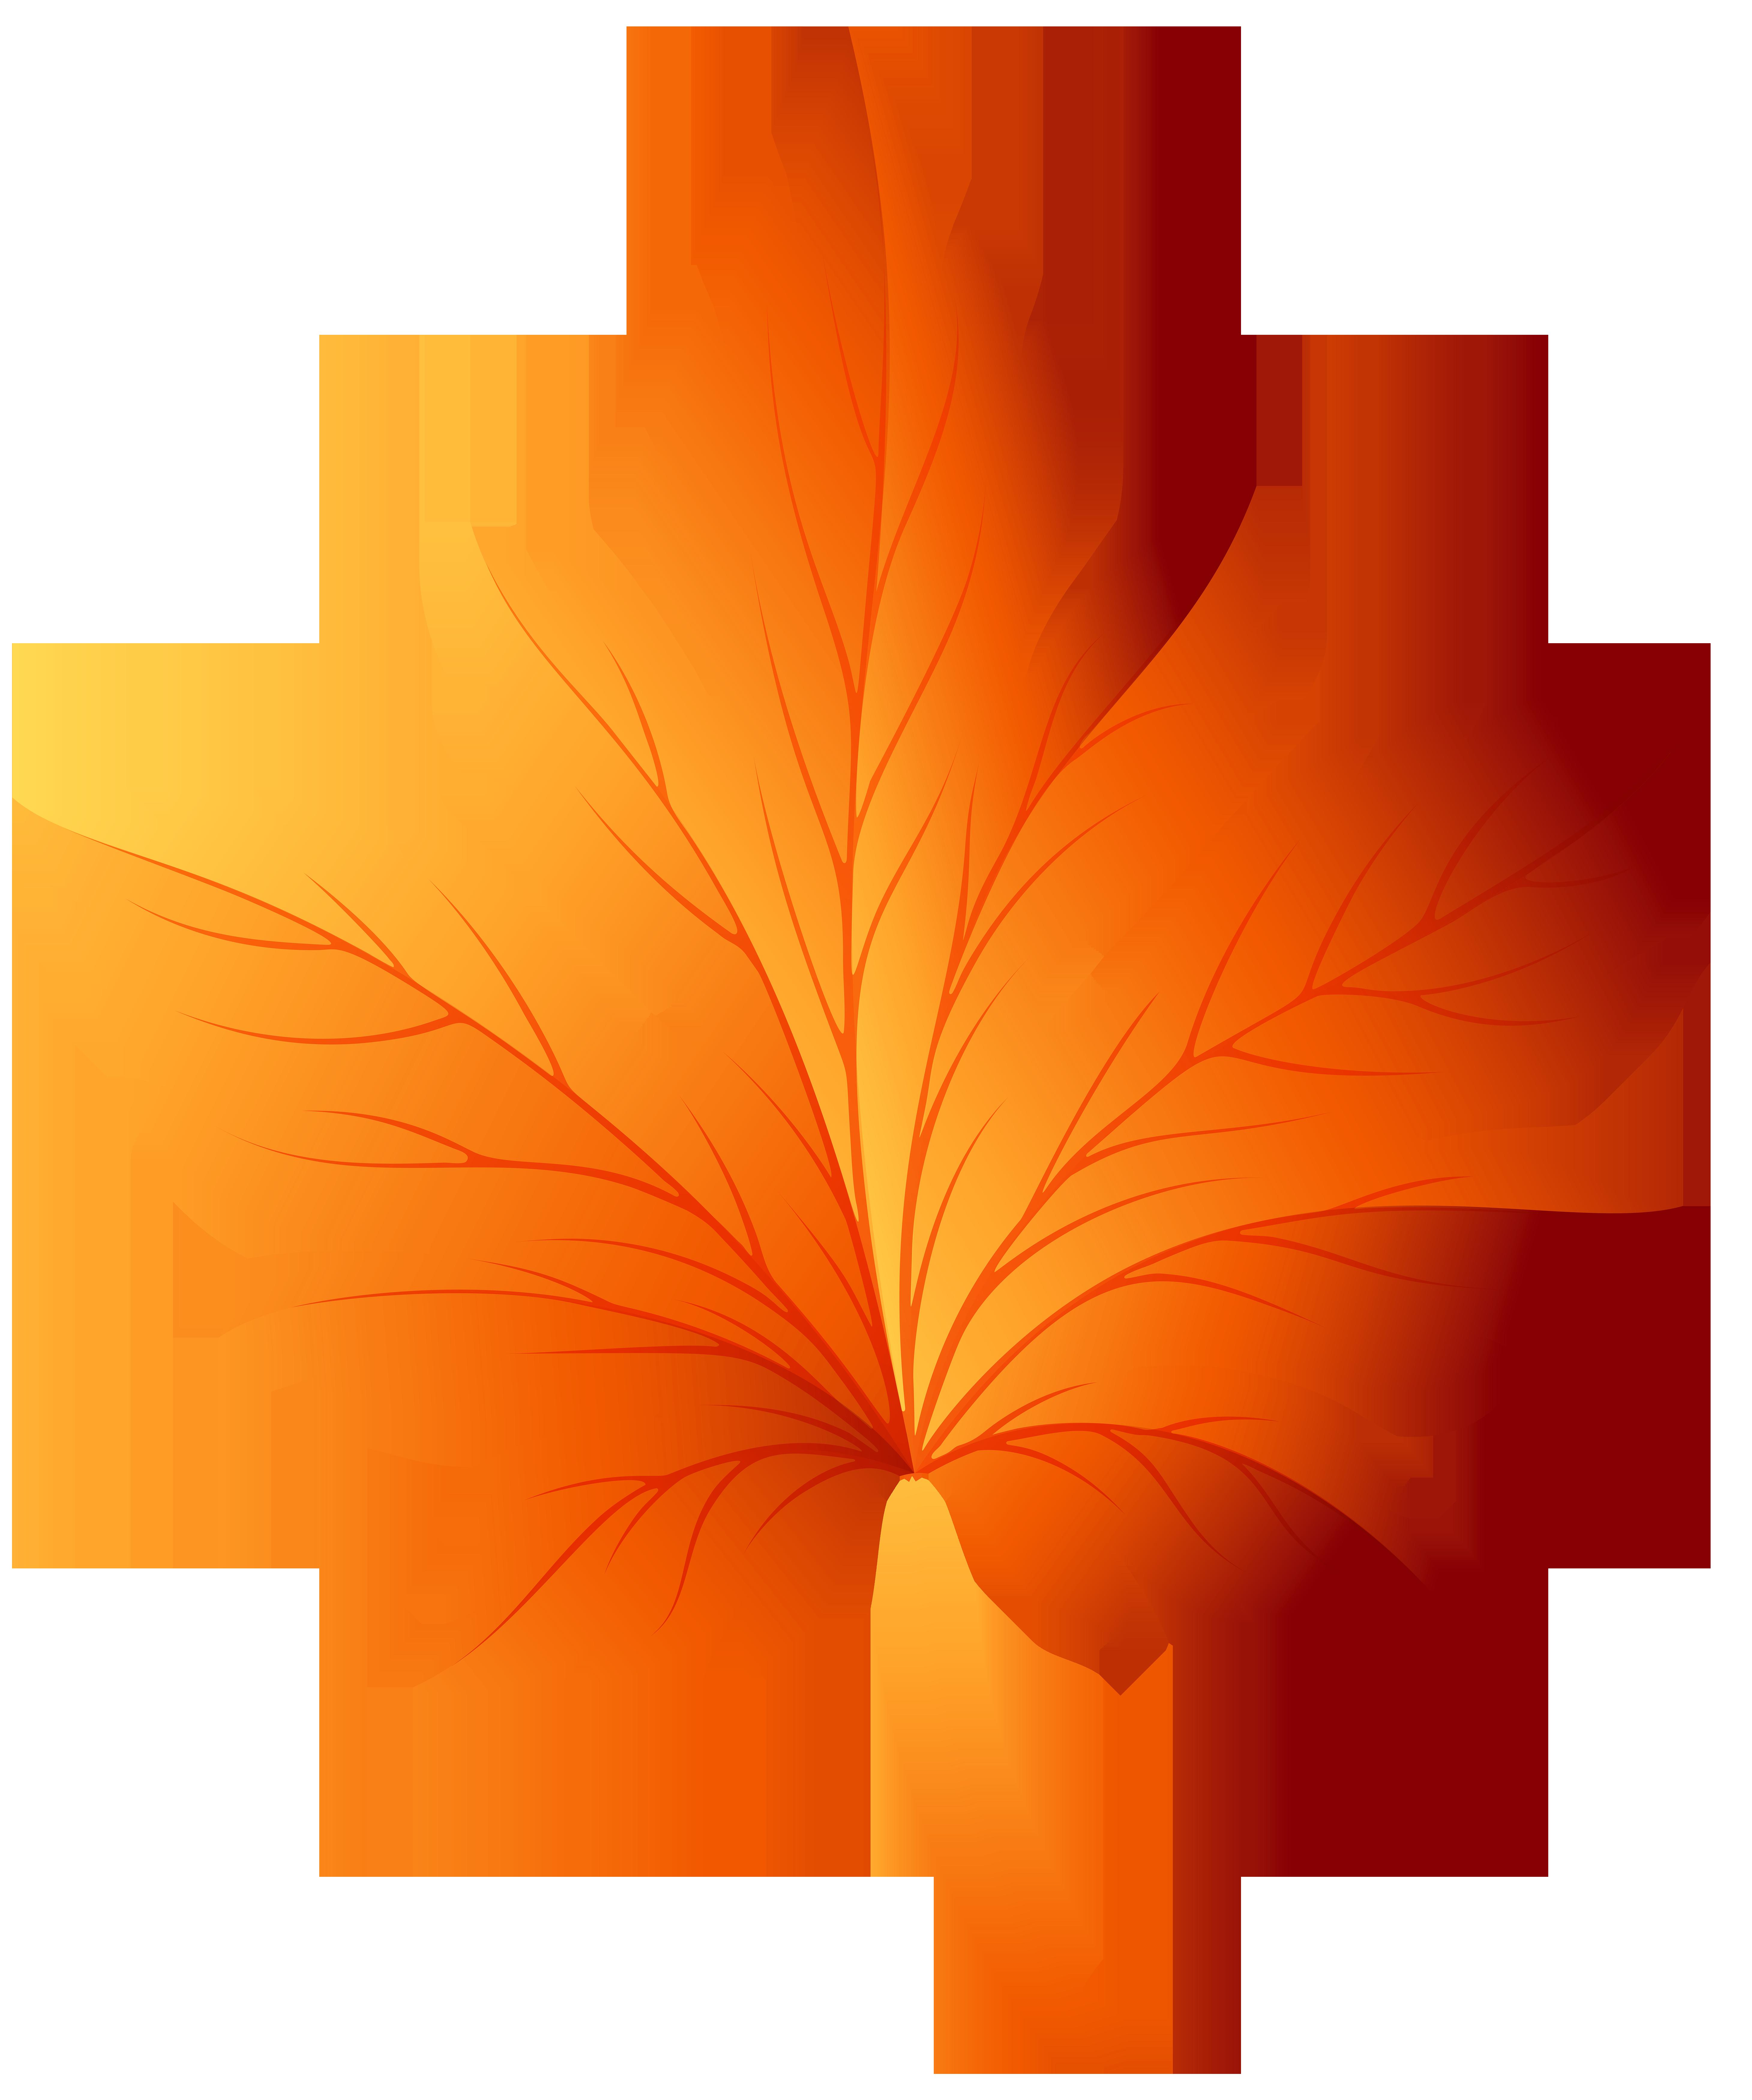 Autumn Leaf Transparent Picture Free Download.